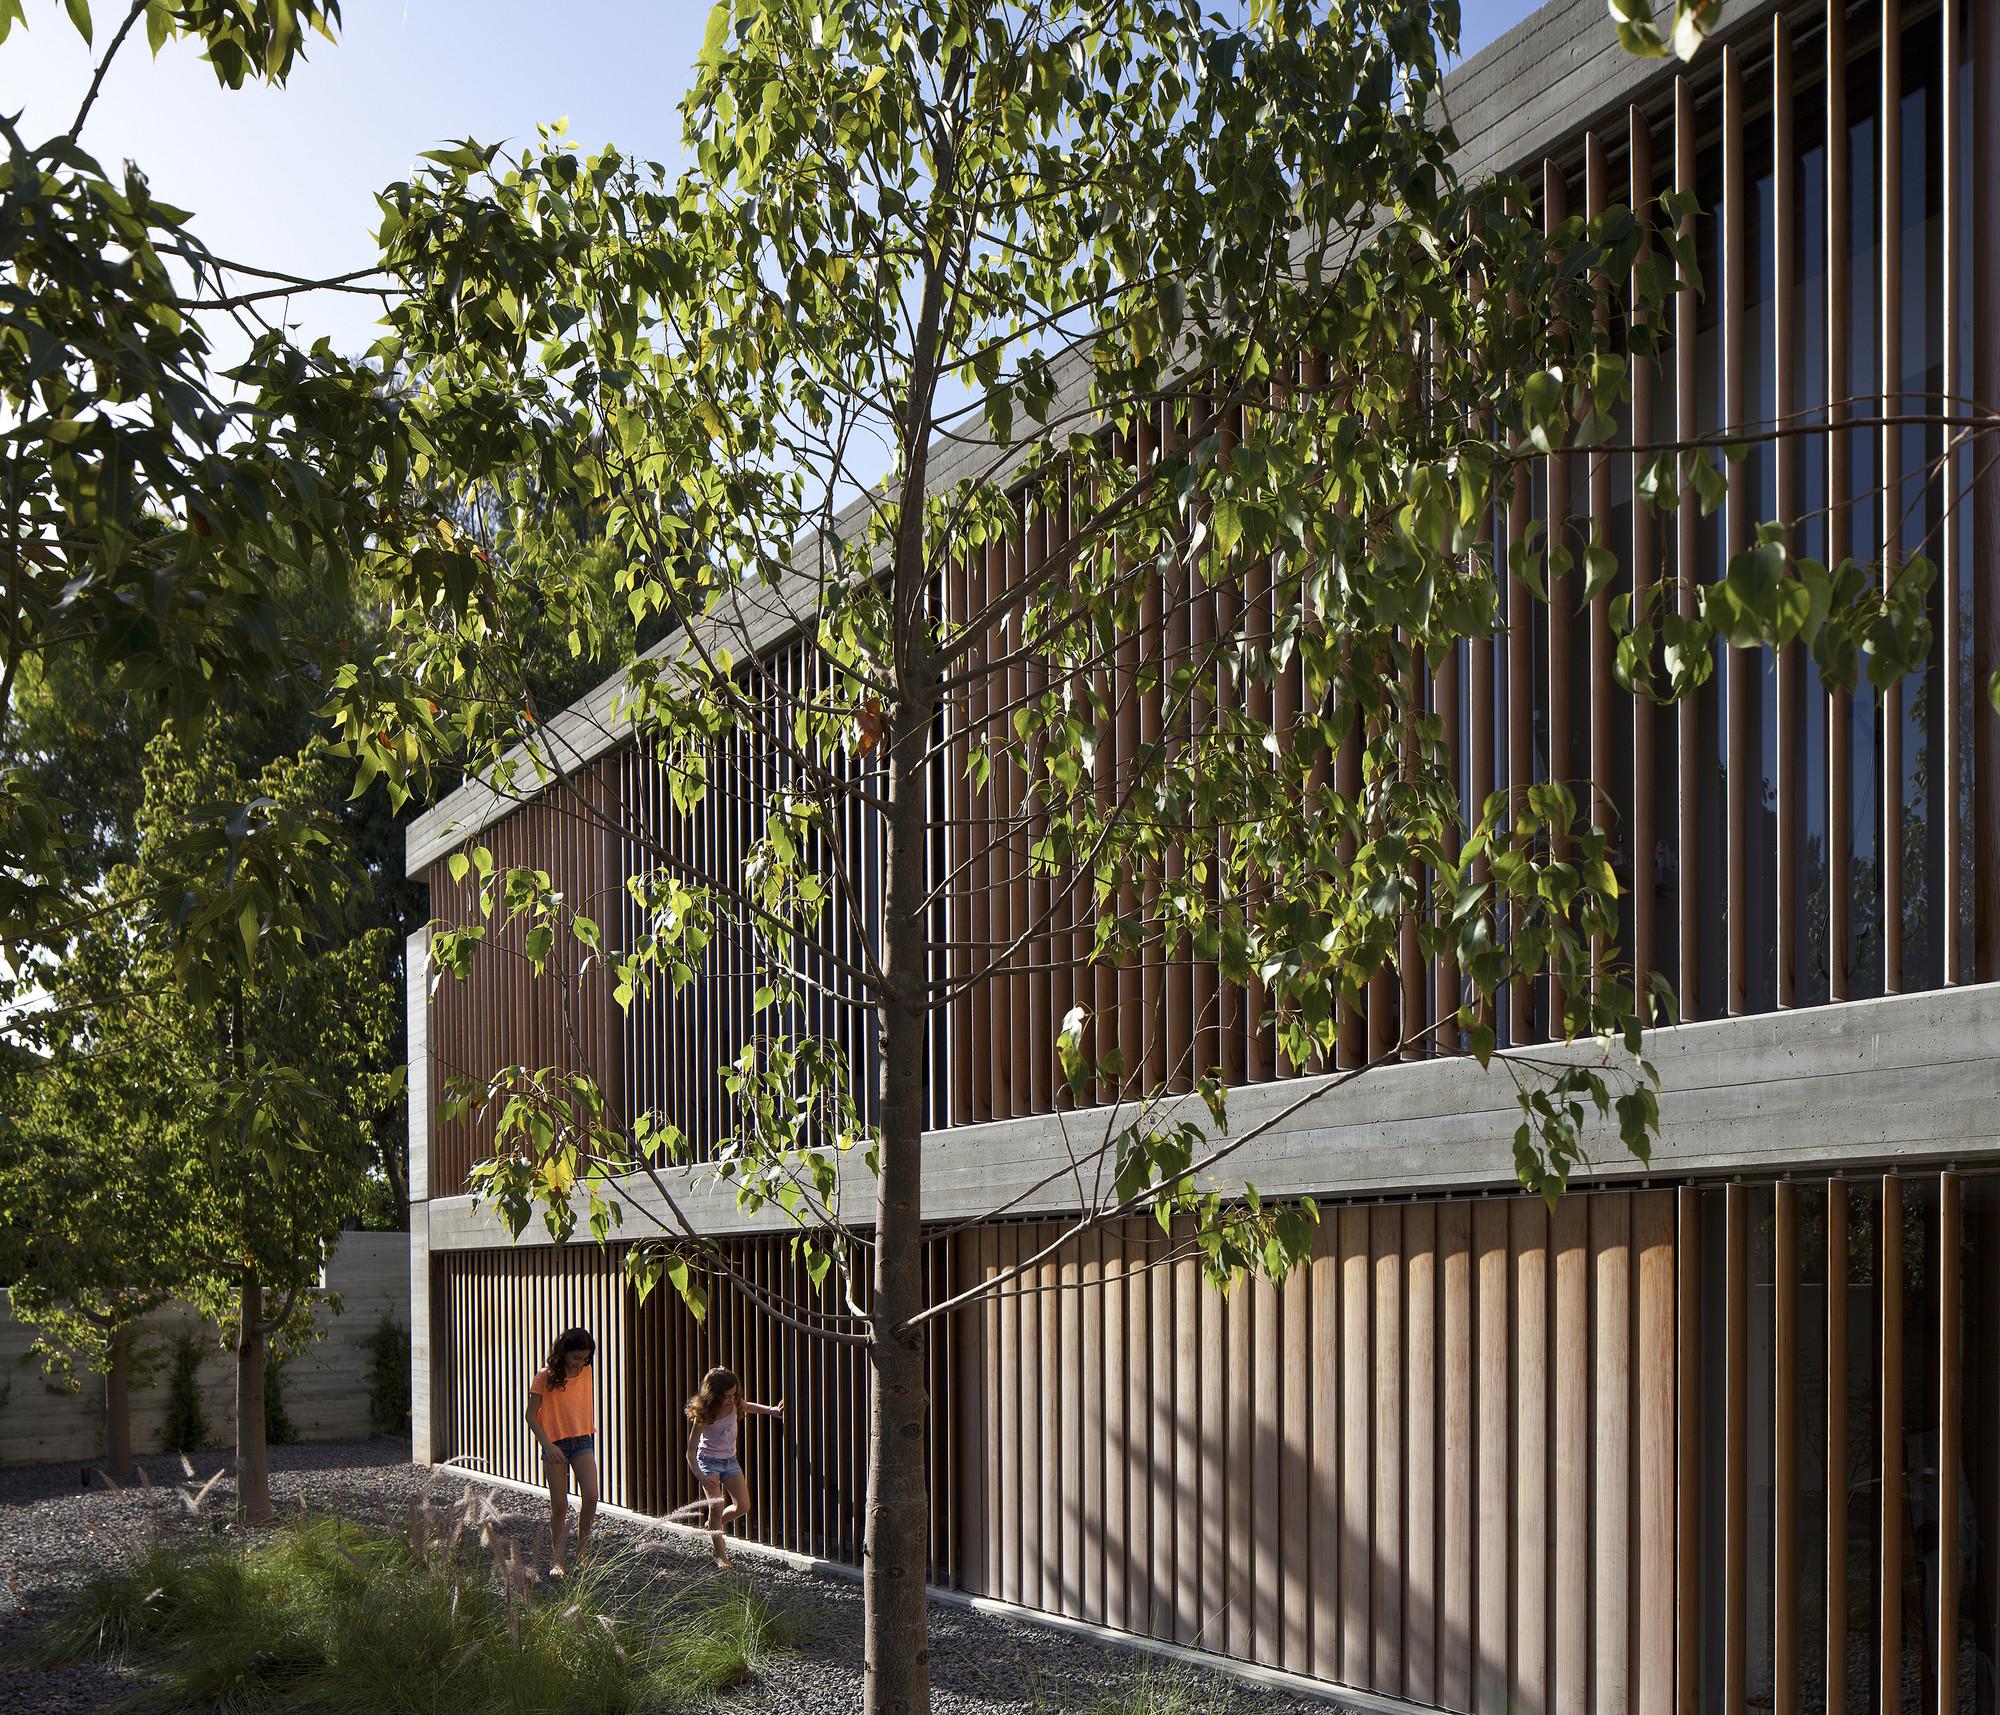 Casa para un Arquitecto  / Pitsou Kedem Architects, © Amit Geron